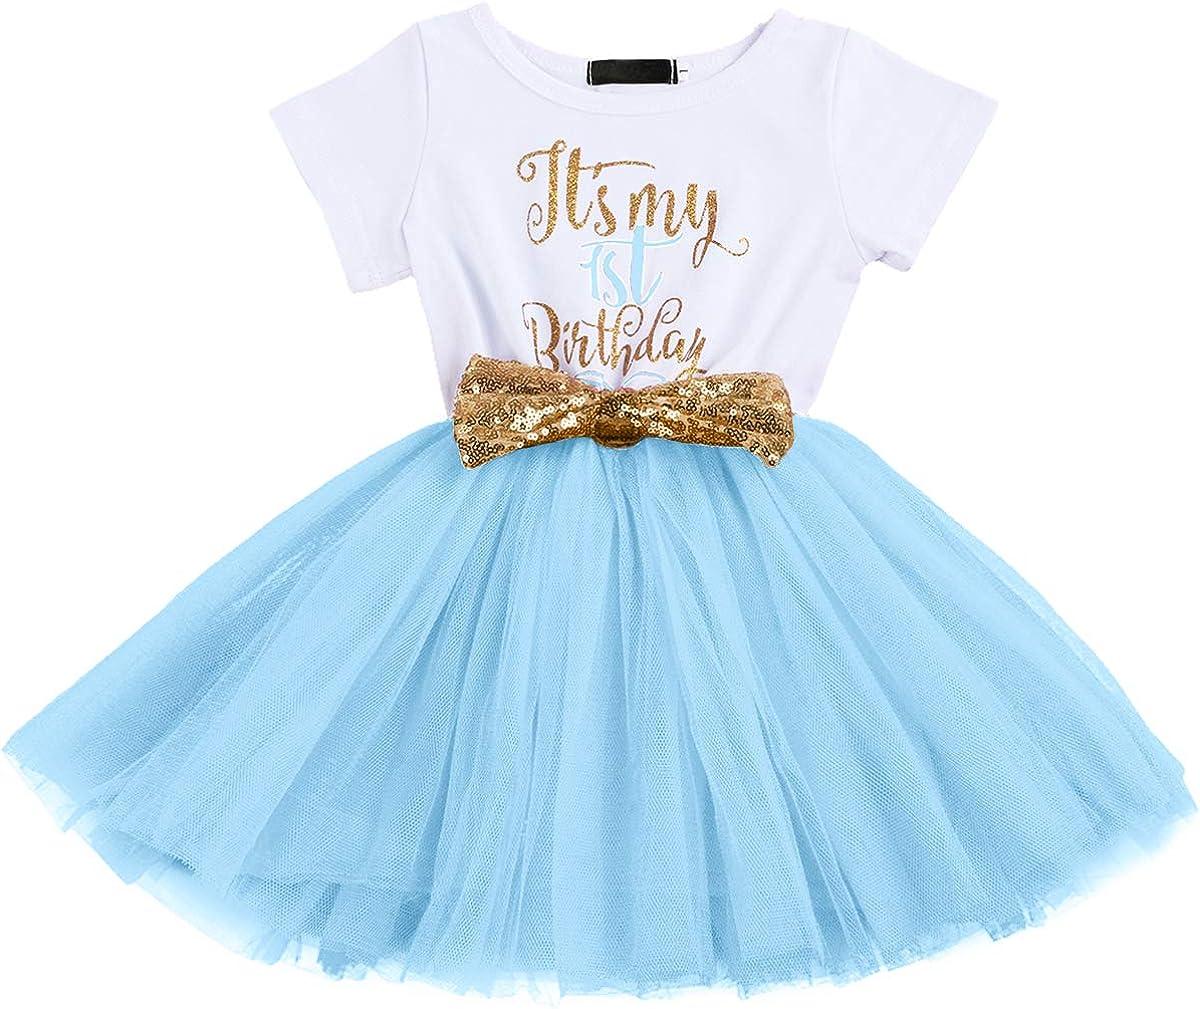 Blue Birthday Party Dress One Glitter Dress Blue Baby Dress Cake Smash Tutu Blue Baby Blue First Birthday Dress One birthday dress